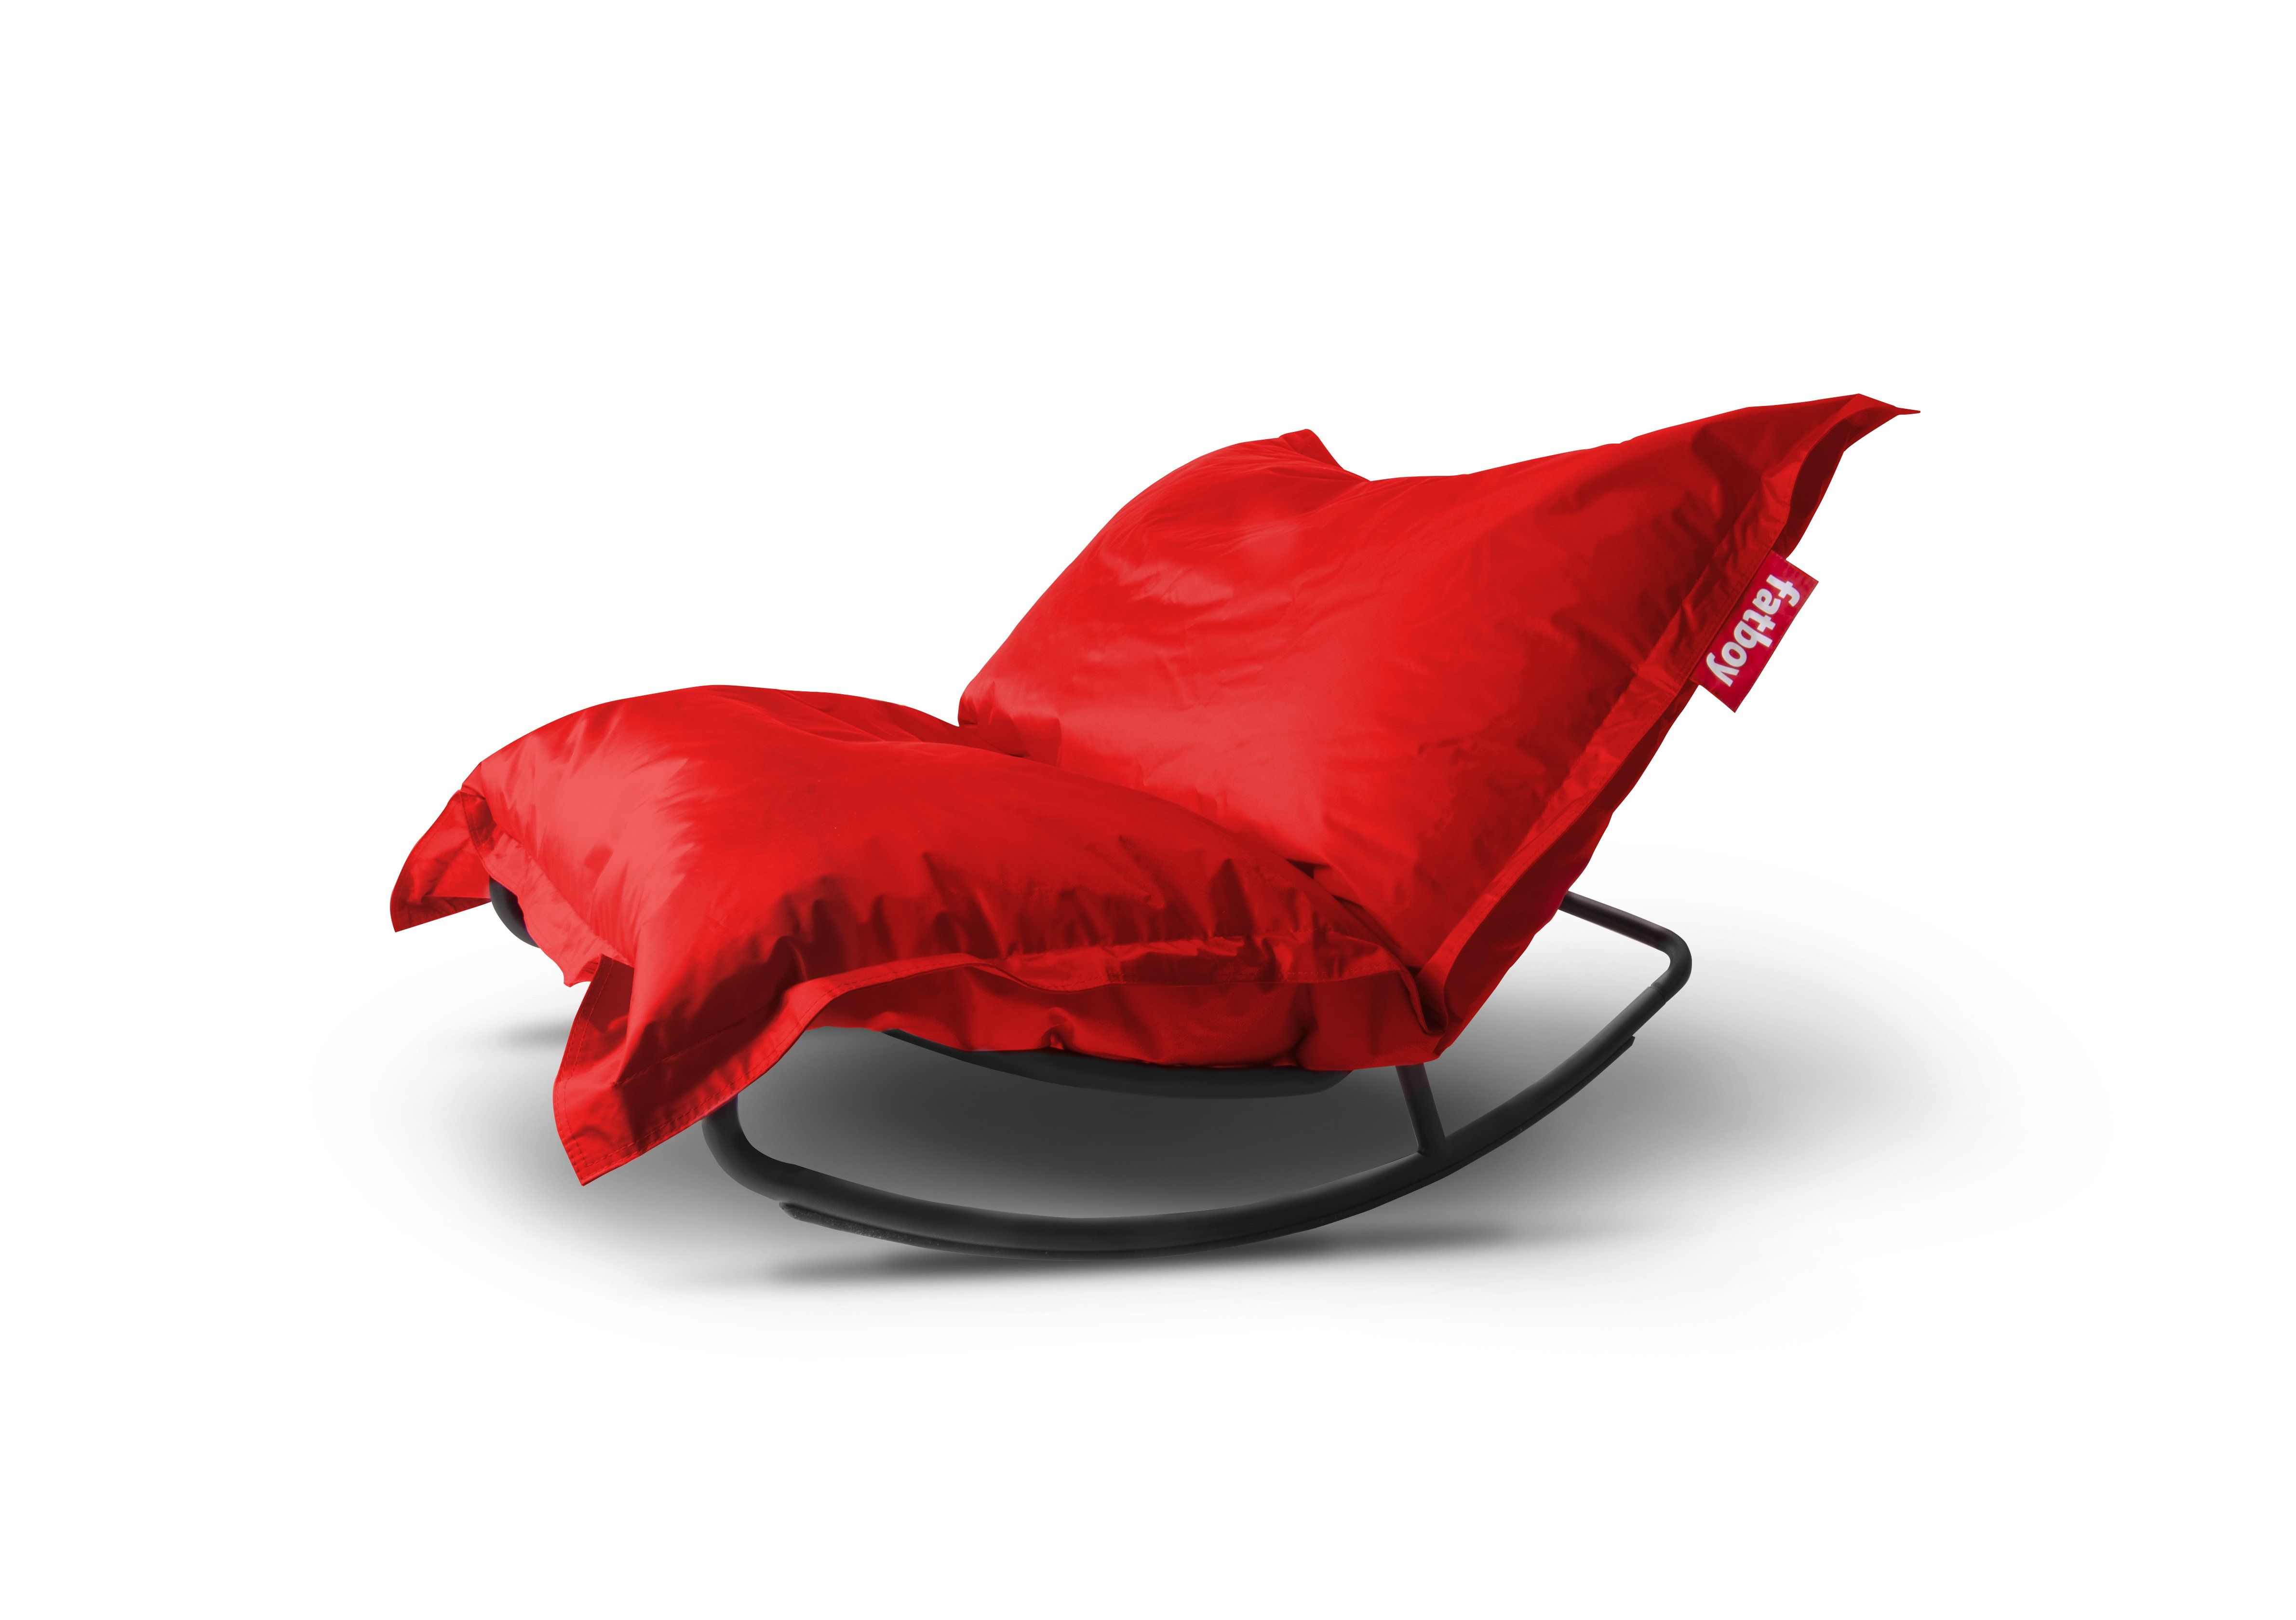 Fatboy Rock Roll Frame Rocking Chair Bean Bag Chair Kids Best Outdoor Furniture